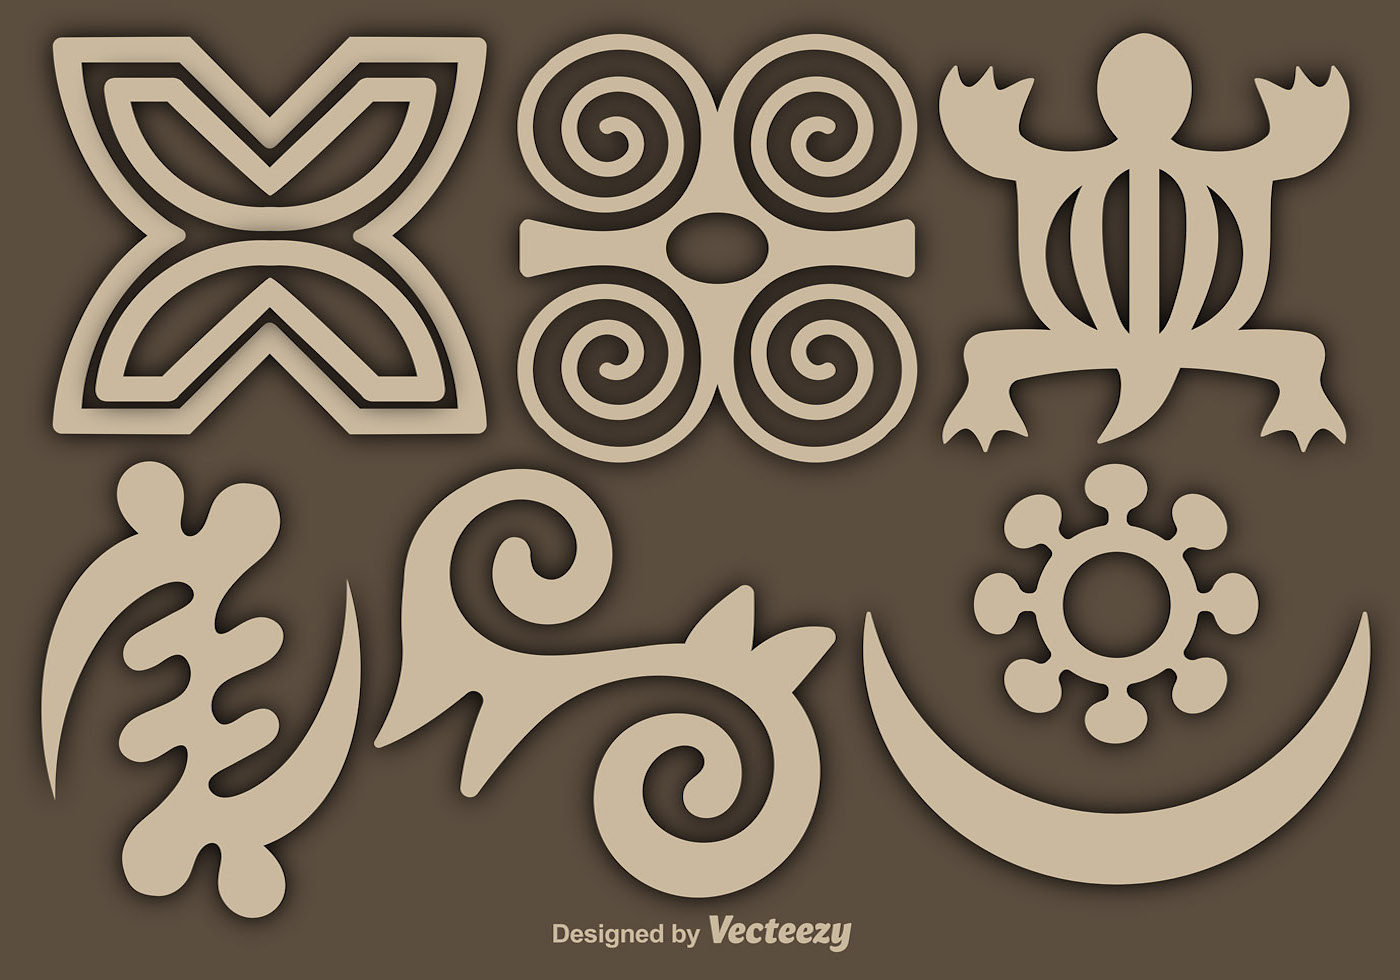 Vector Adinkra Symbols Set Download Free Vector Art Stock